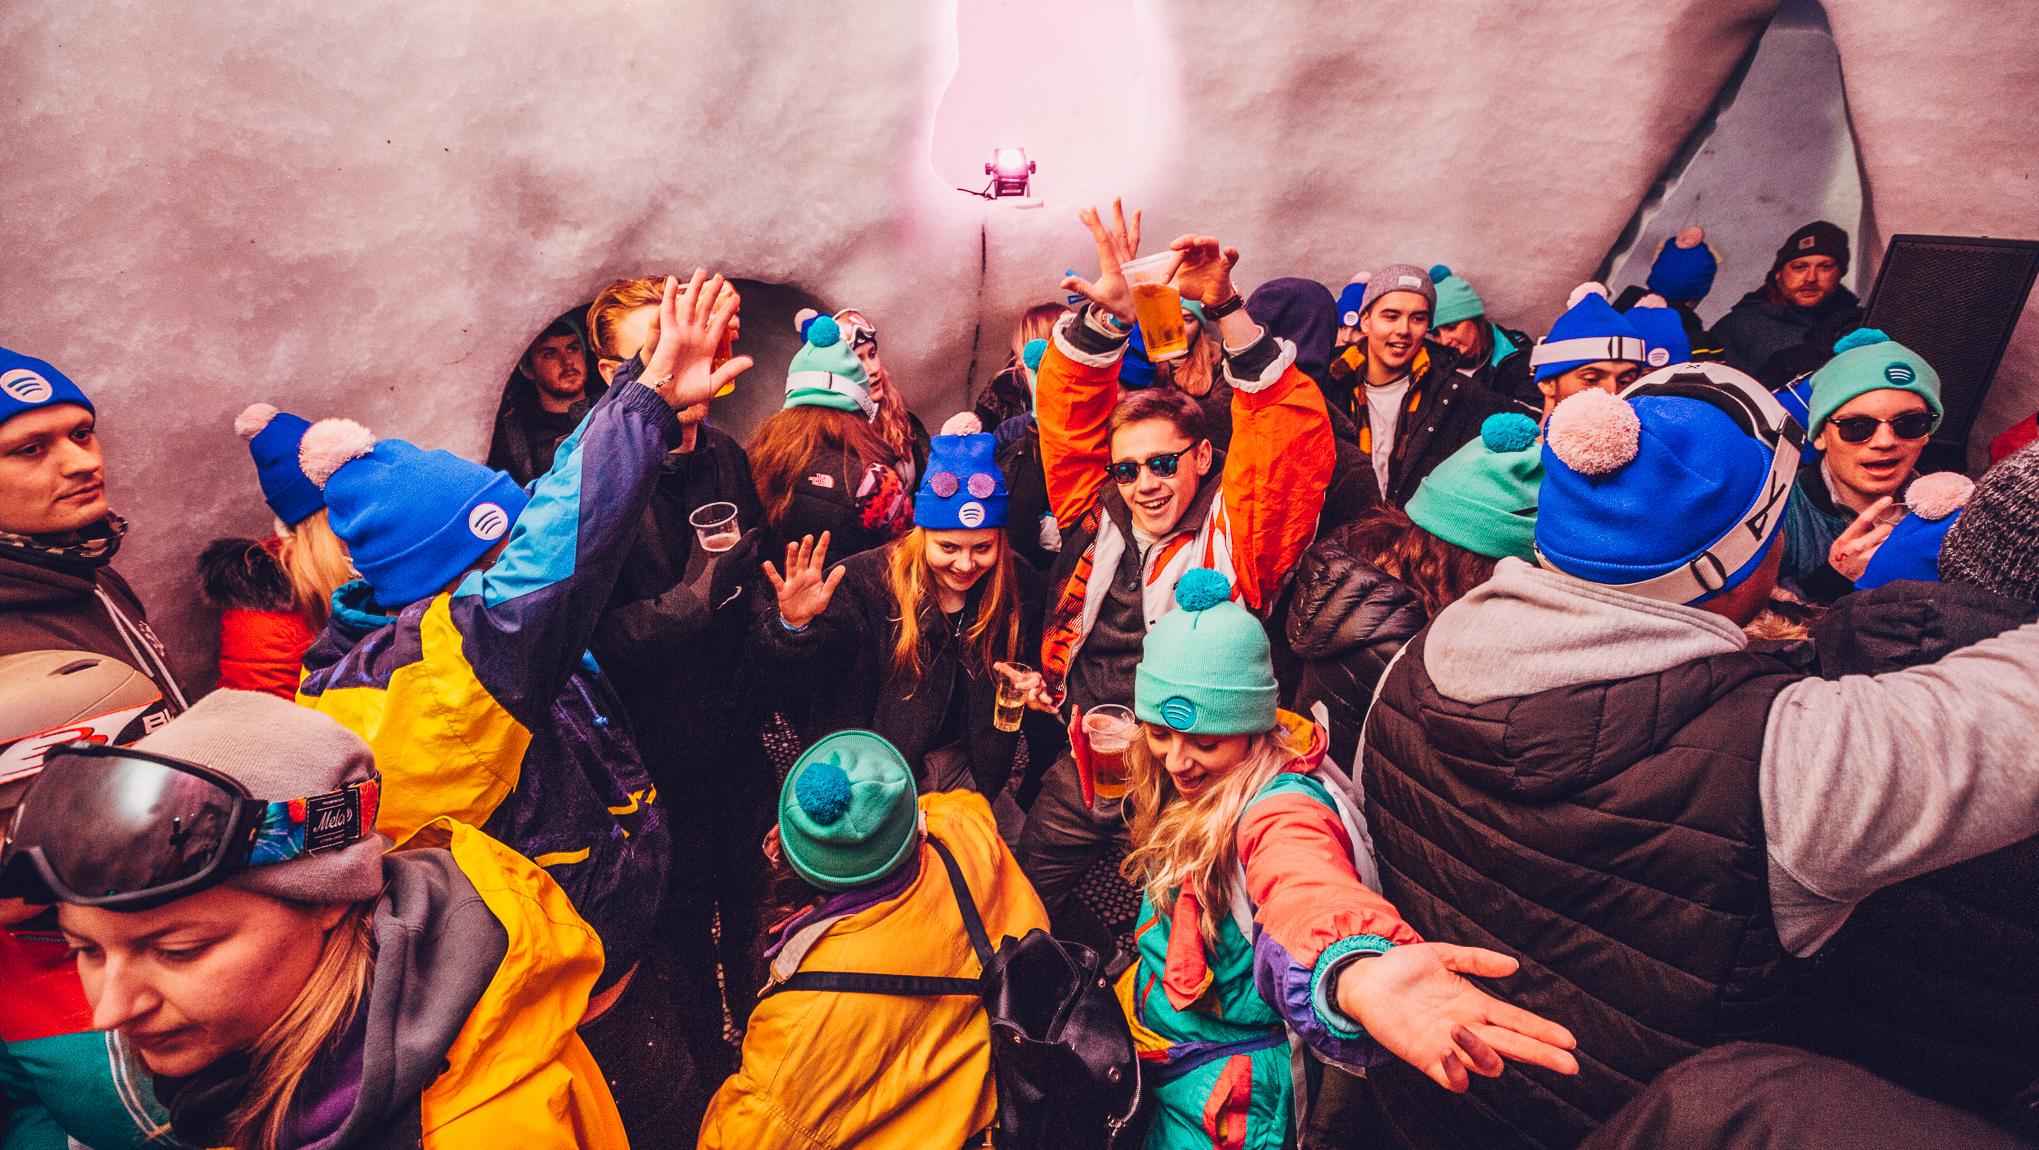 Igloo party ravers in retro ski gear